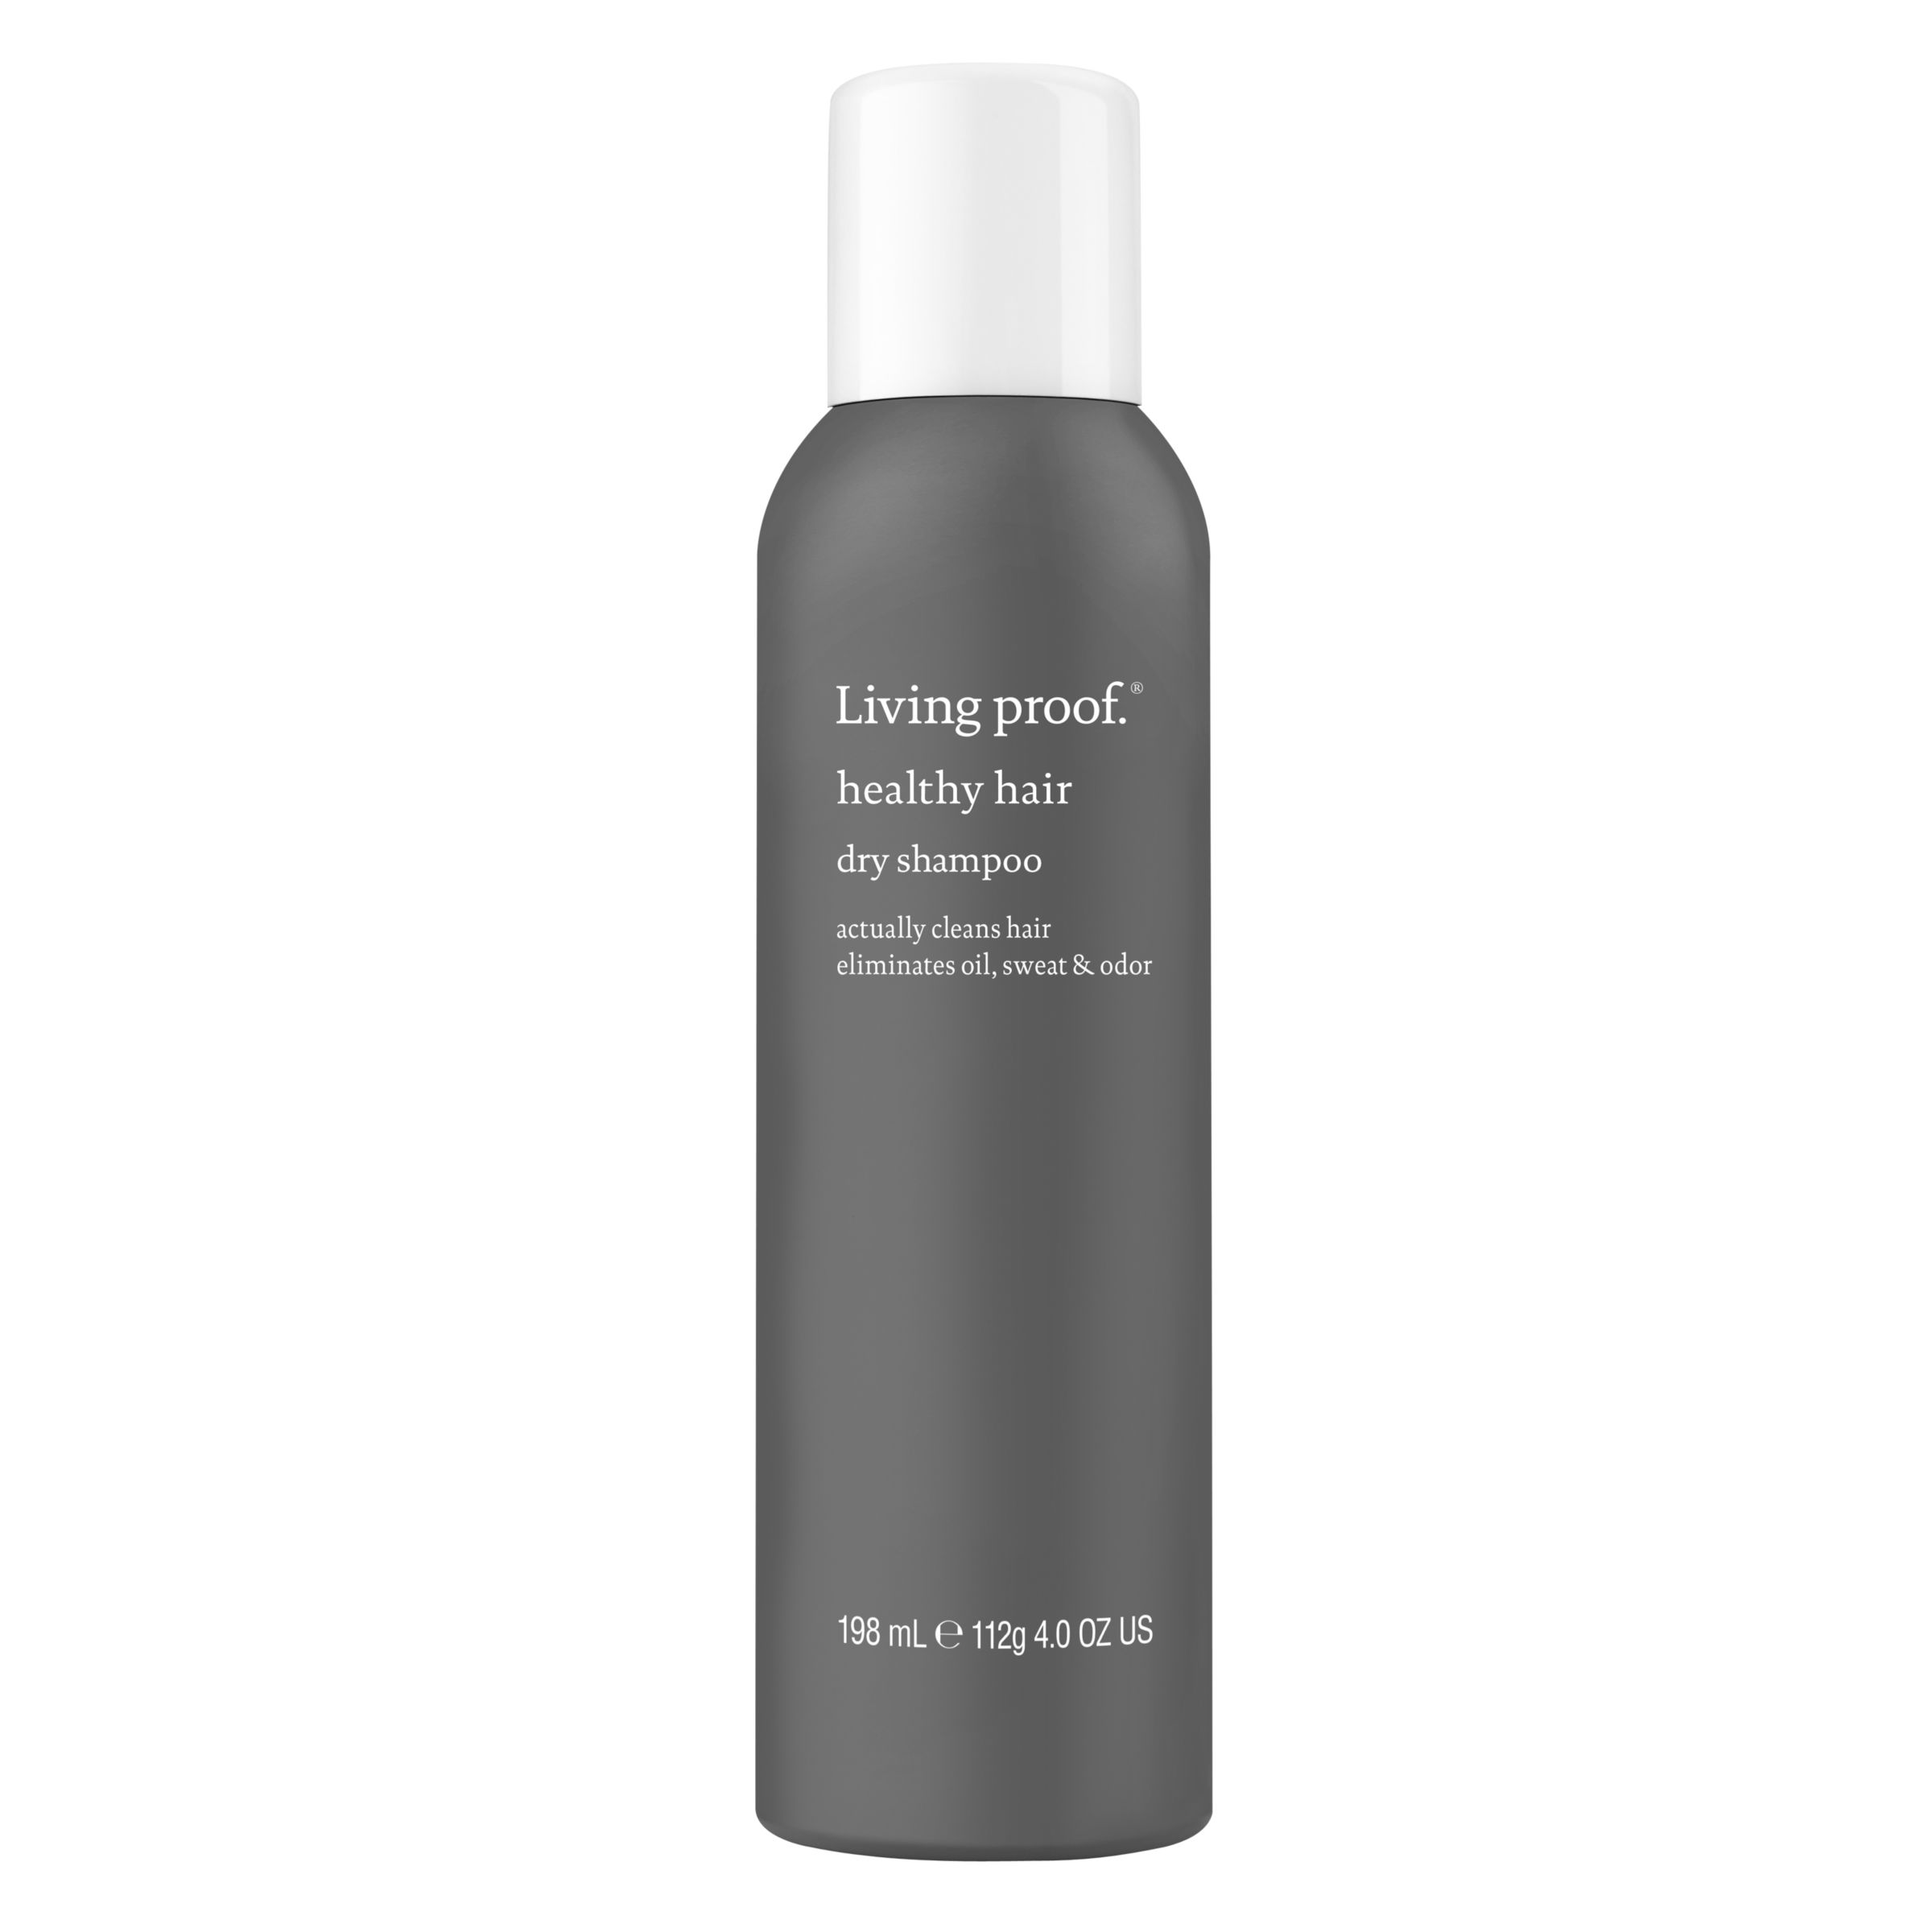 Living Proof Living Proof Healthy Hair Dry Shampoo, 198ml